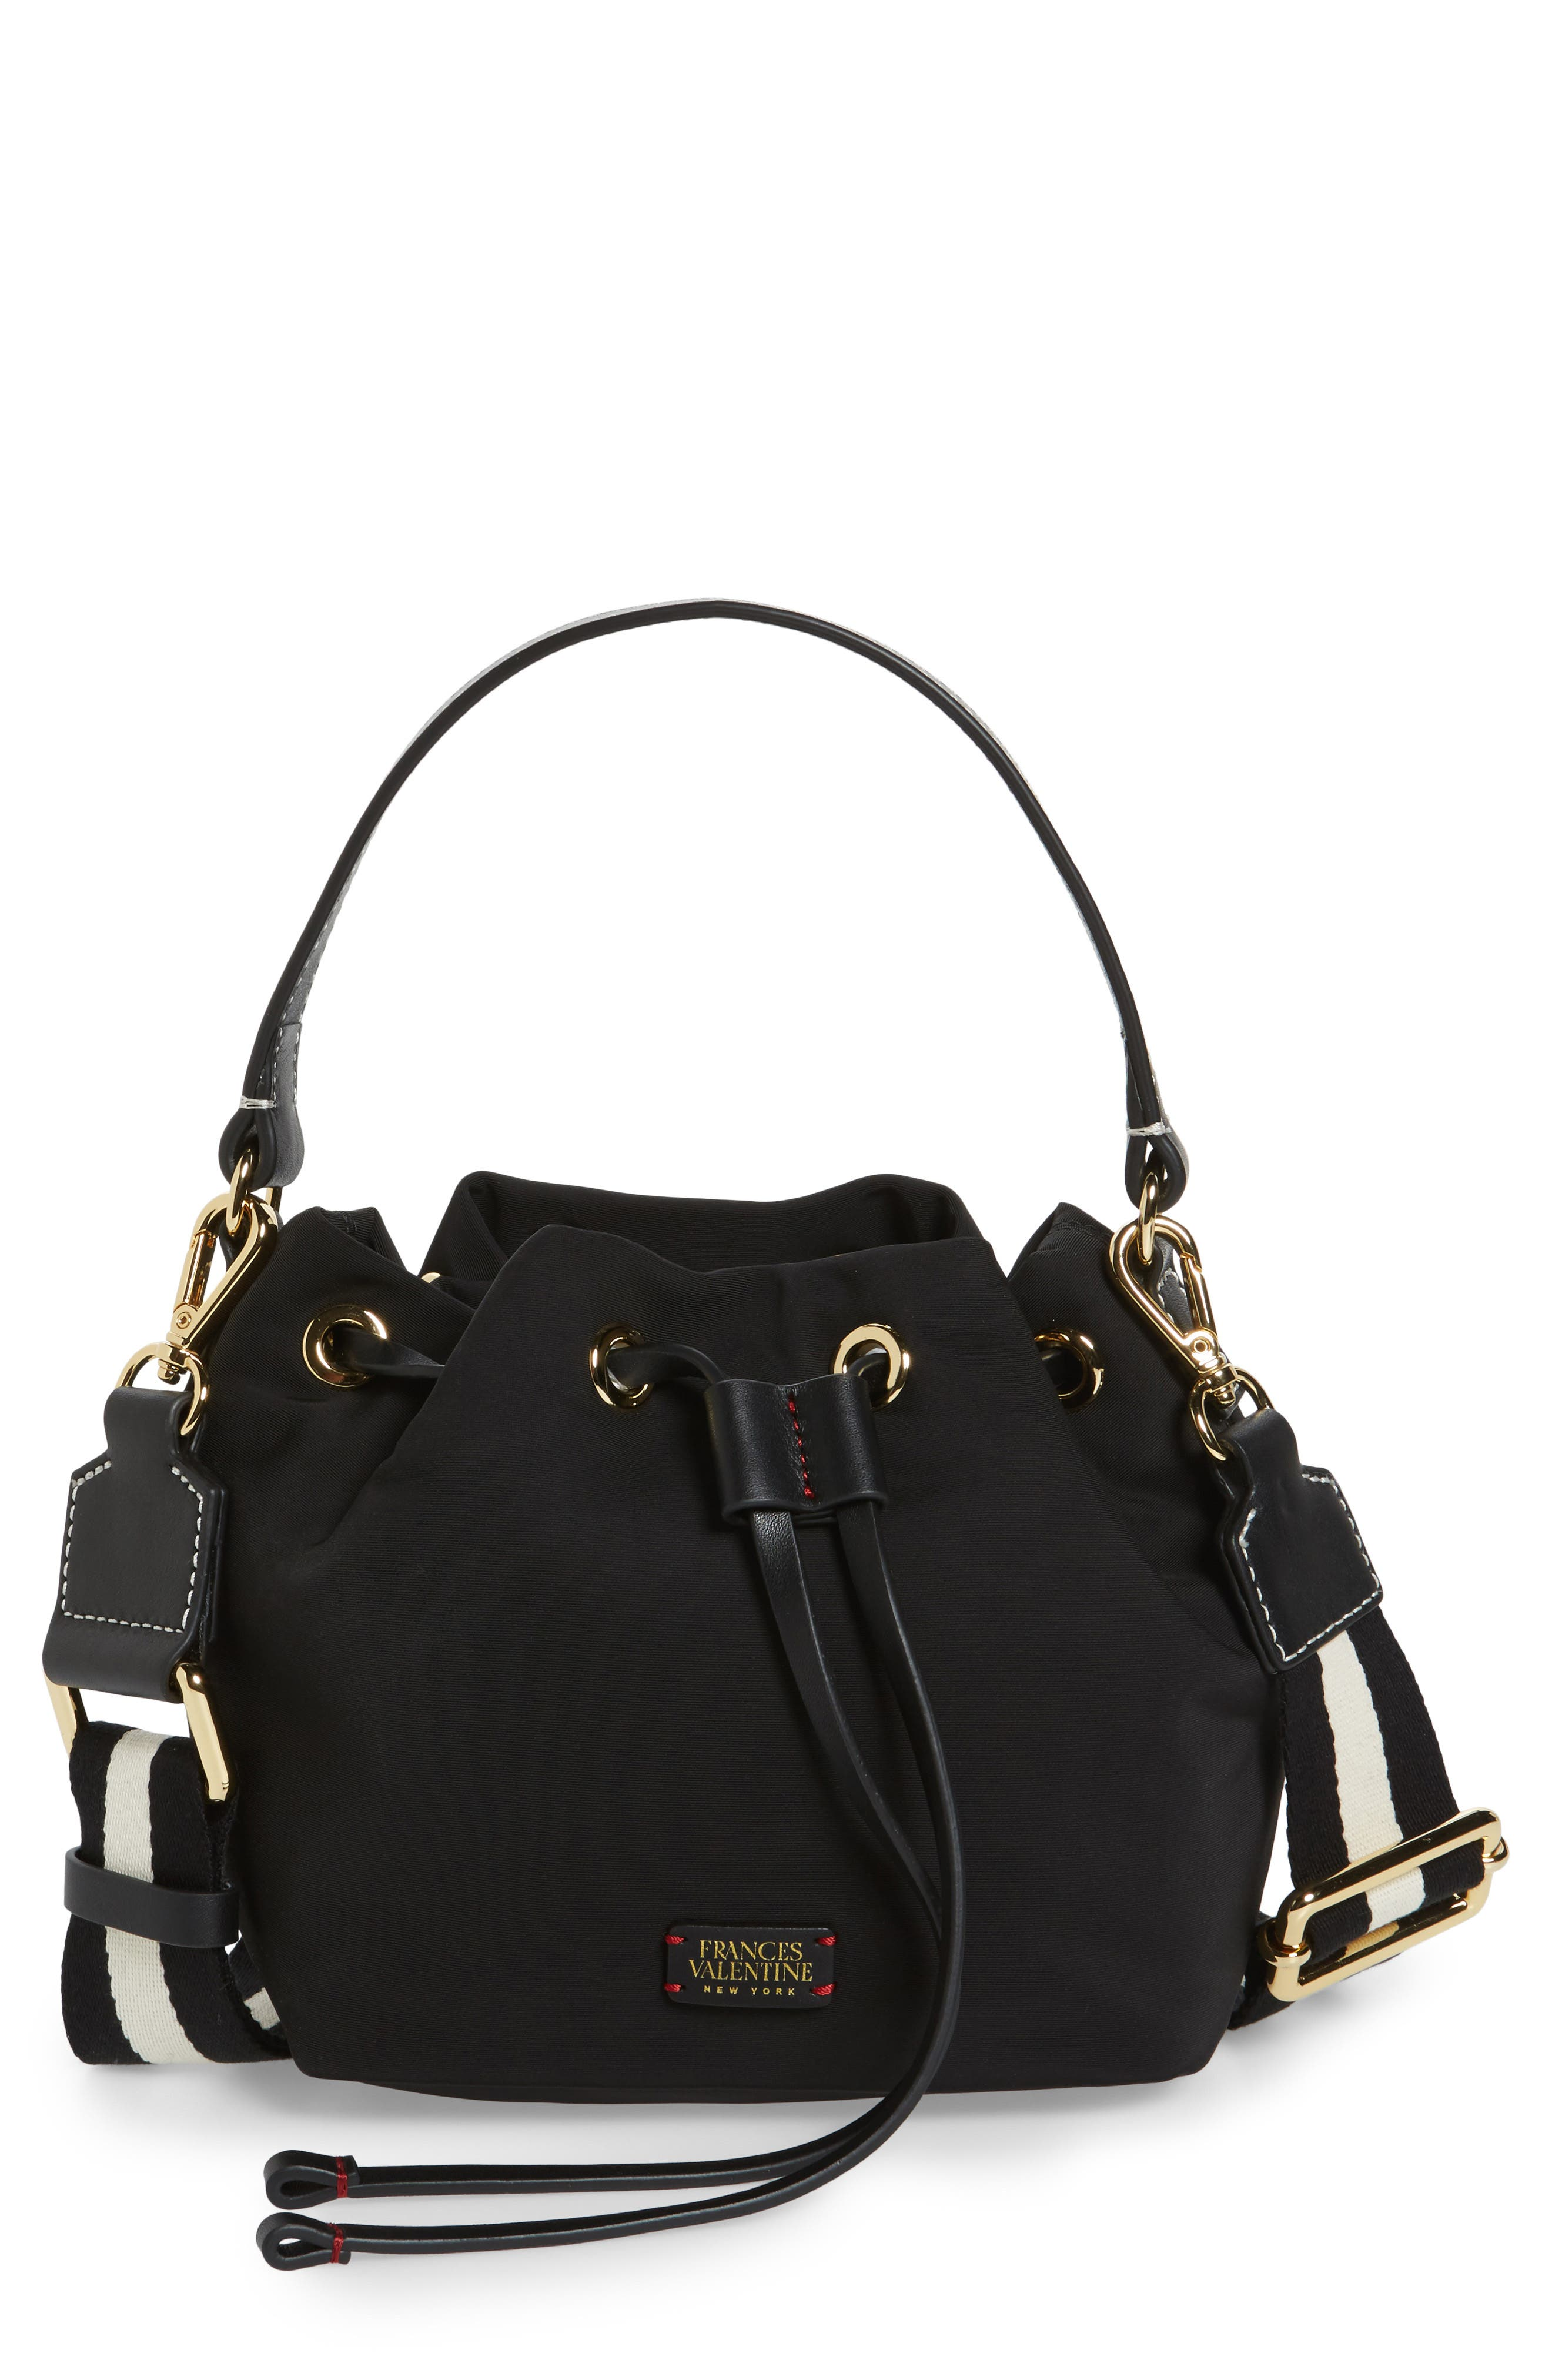 Frances Valentine Small Ann Nylon Bucket Bag